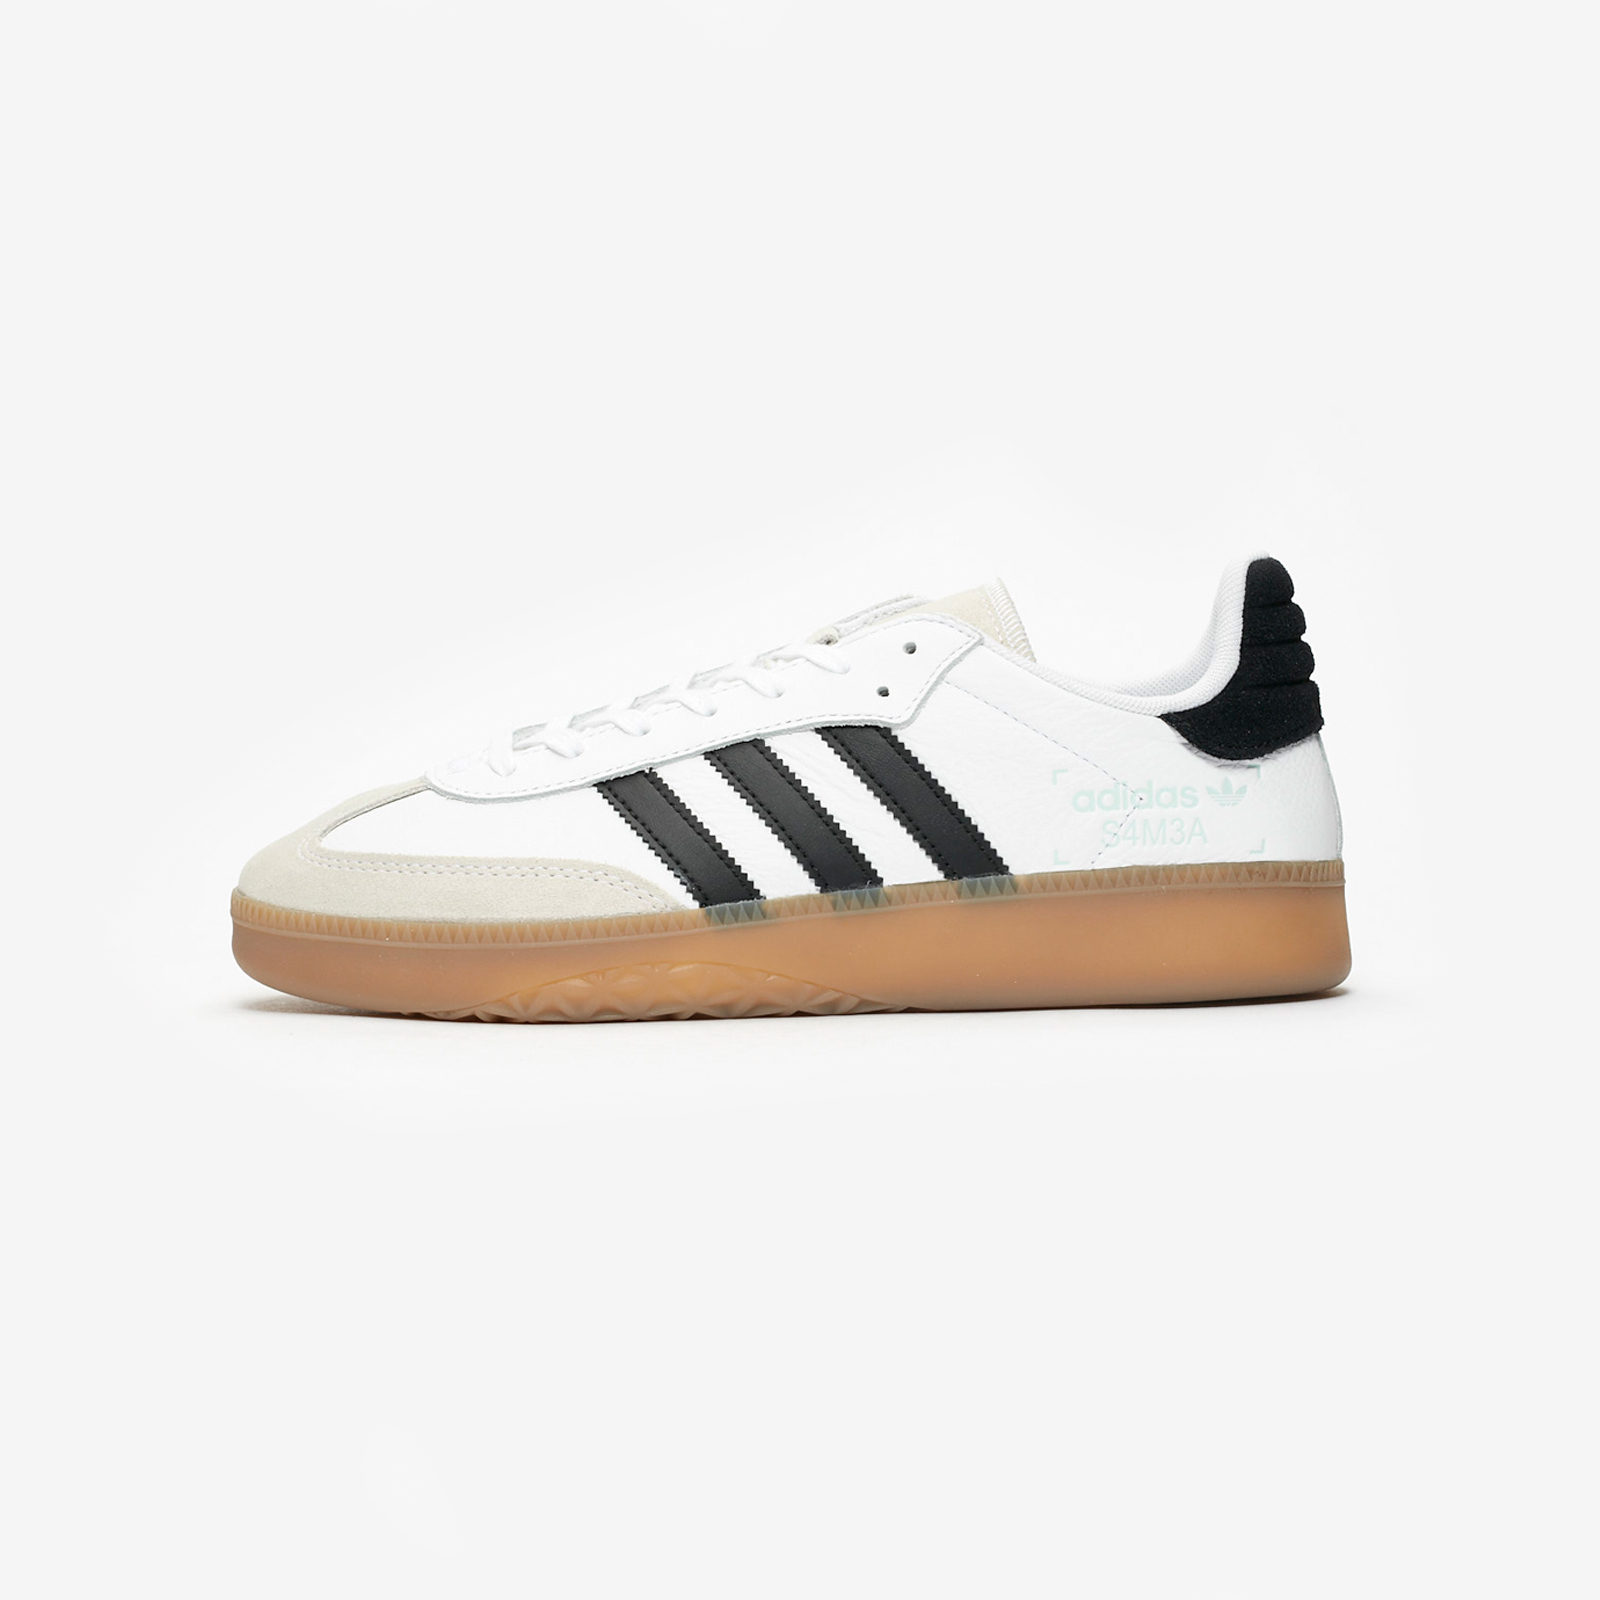 adidas Samba RM - Bd7537